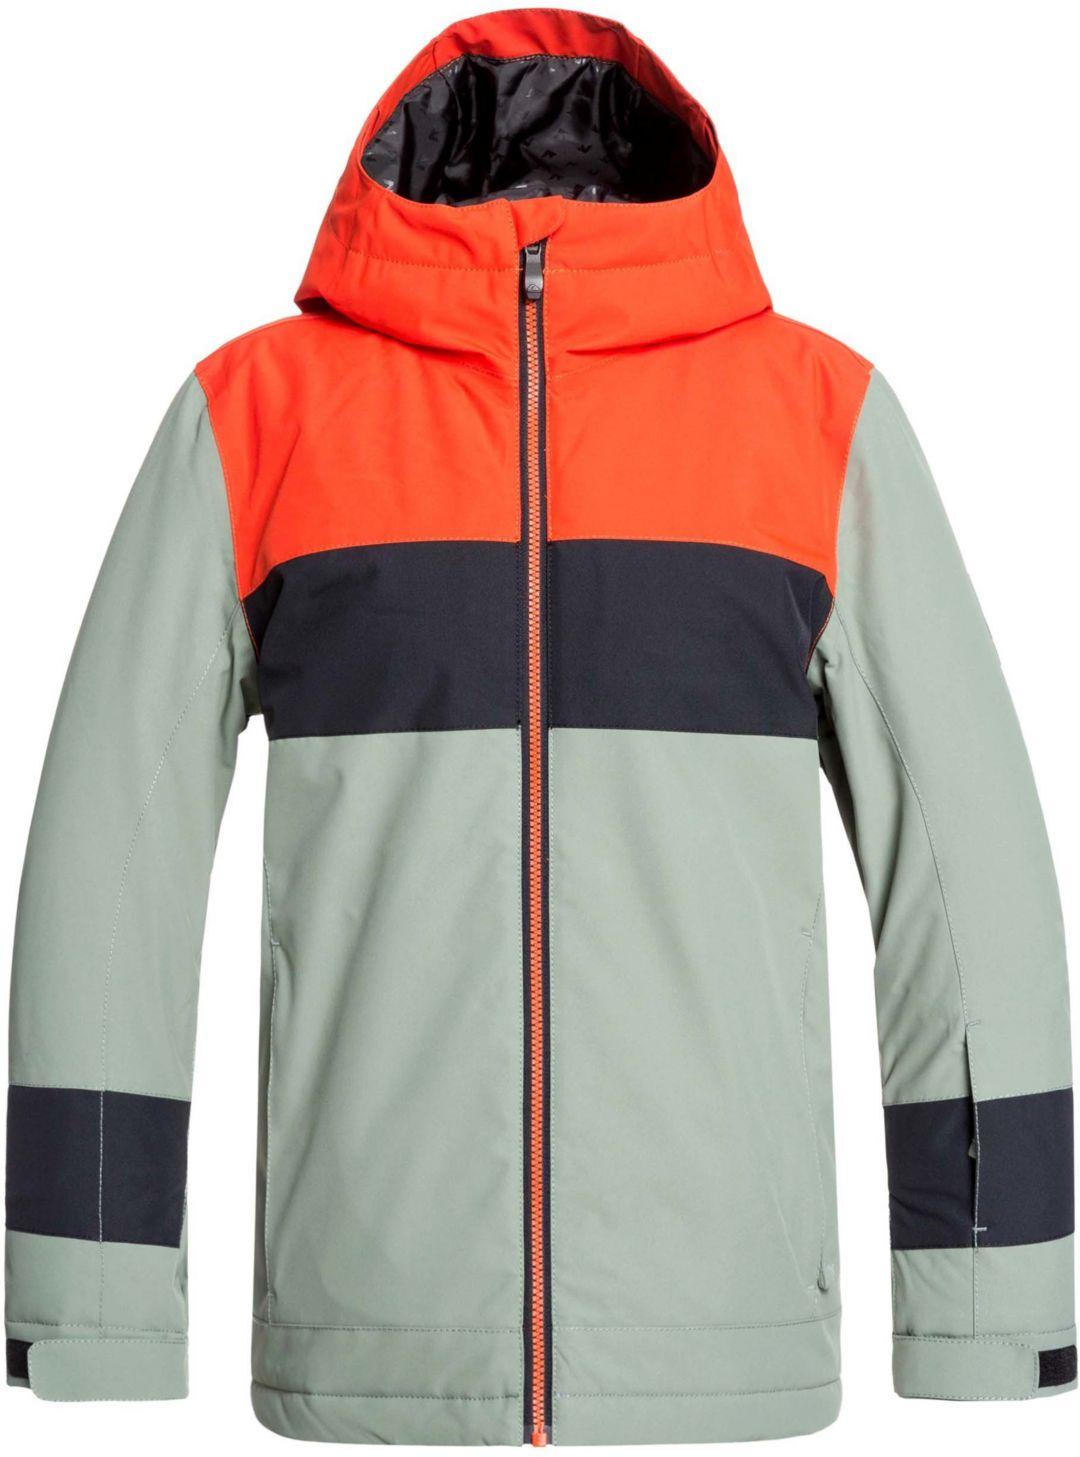 8c6a7d57e Quiksilver Boys' Sycamore Insulated Snow Jacket